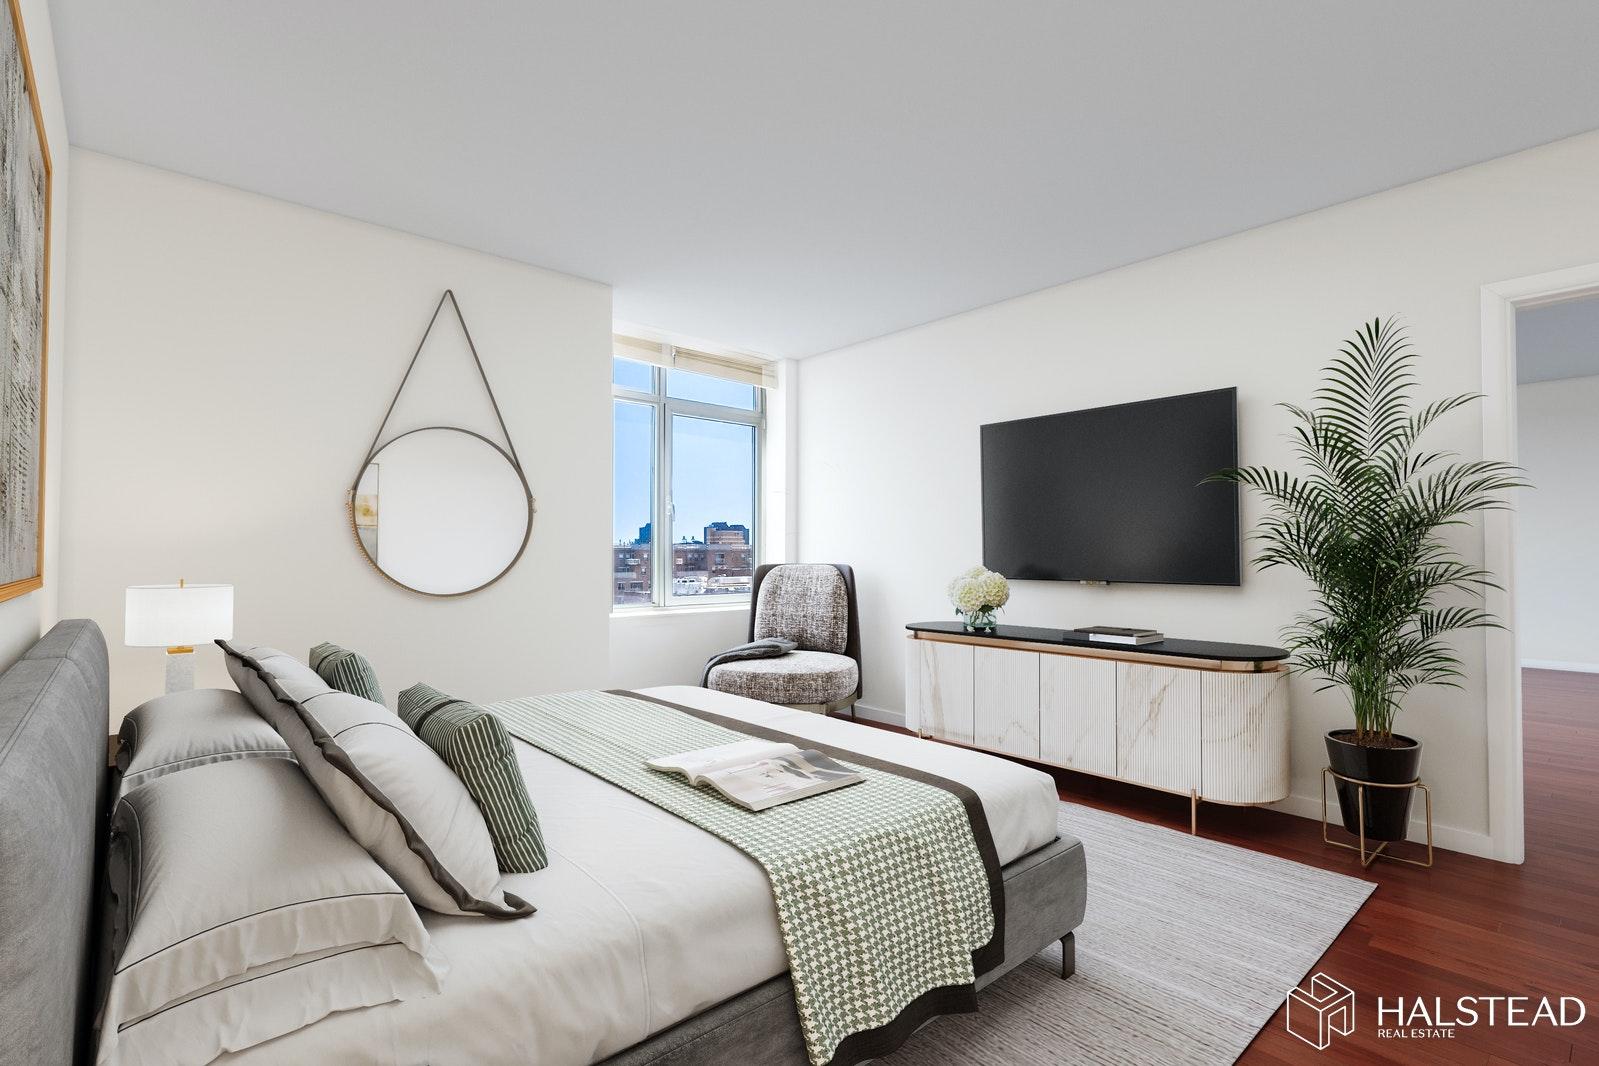 Apartment for sale at 1485 Fifth Avenue, Apt 9E